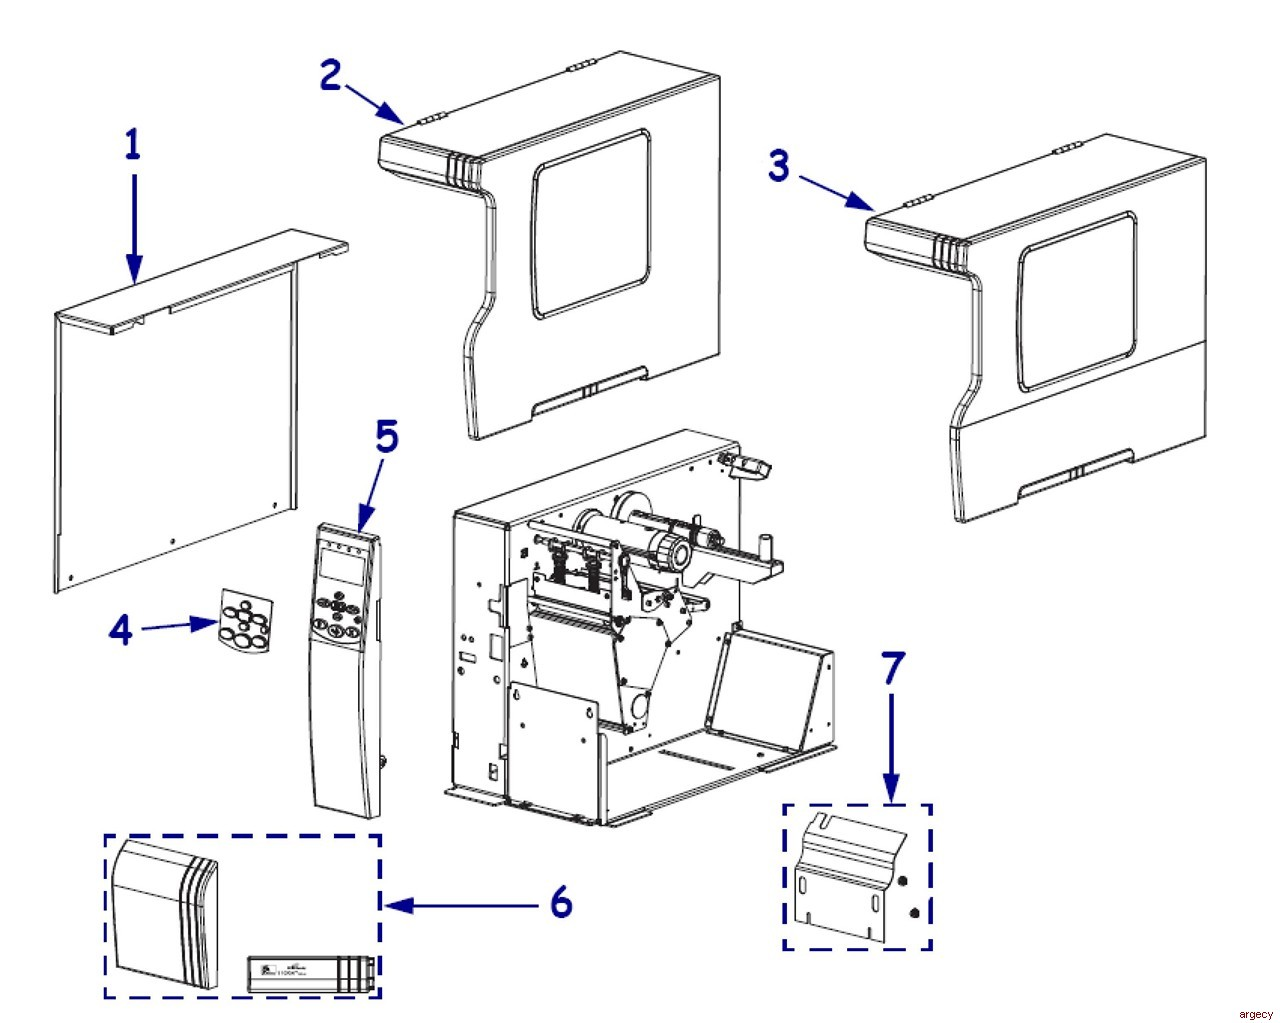 Pdf Daihatsu Mower Motor Manual Wiring Diagram Zebra 4m Auto Electrical Rh Electrowiring Herokuapp Com